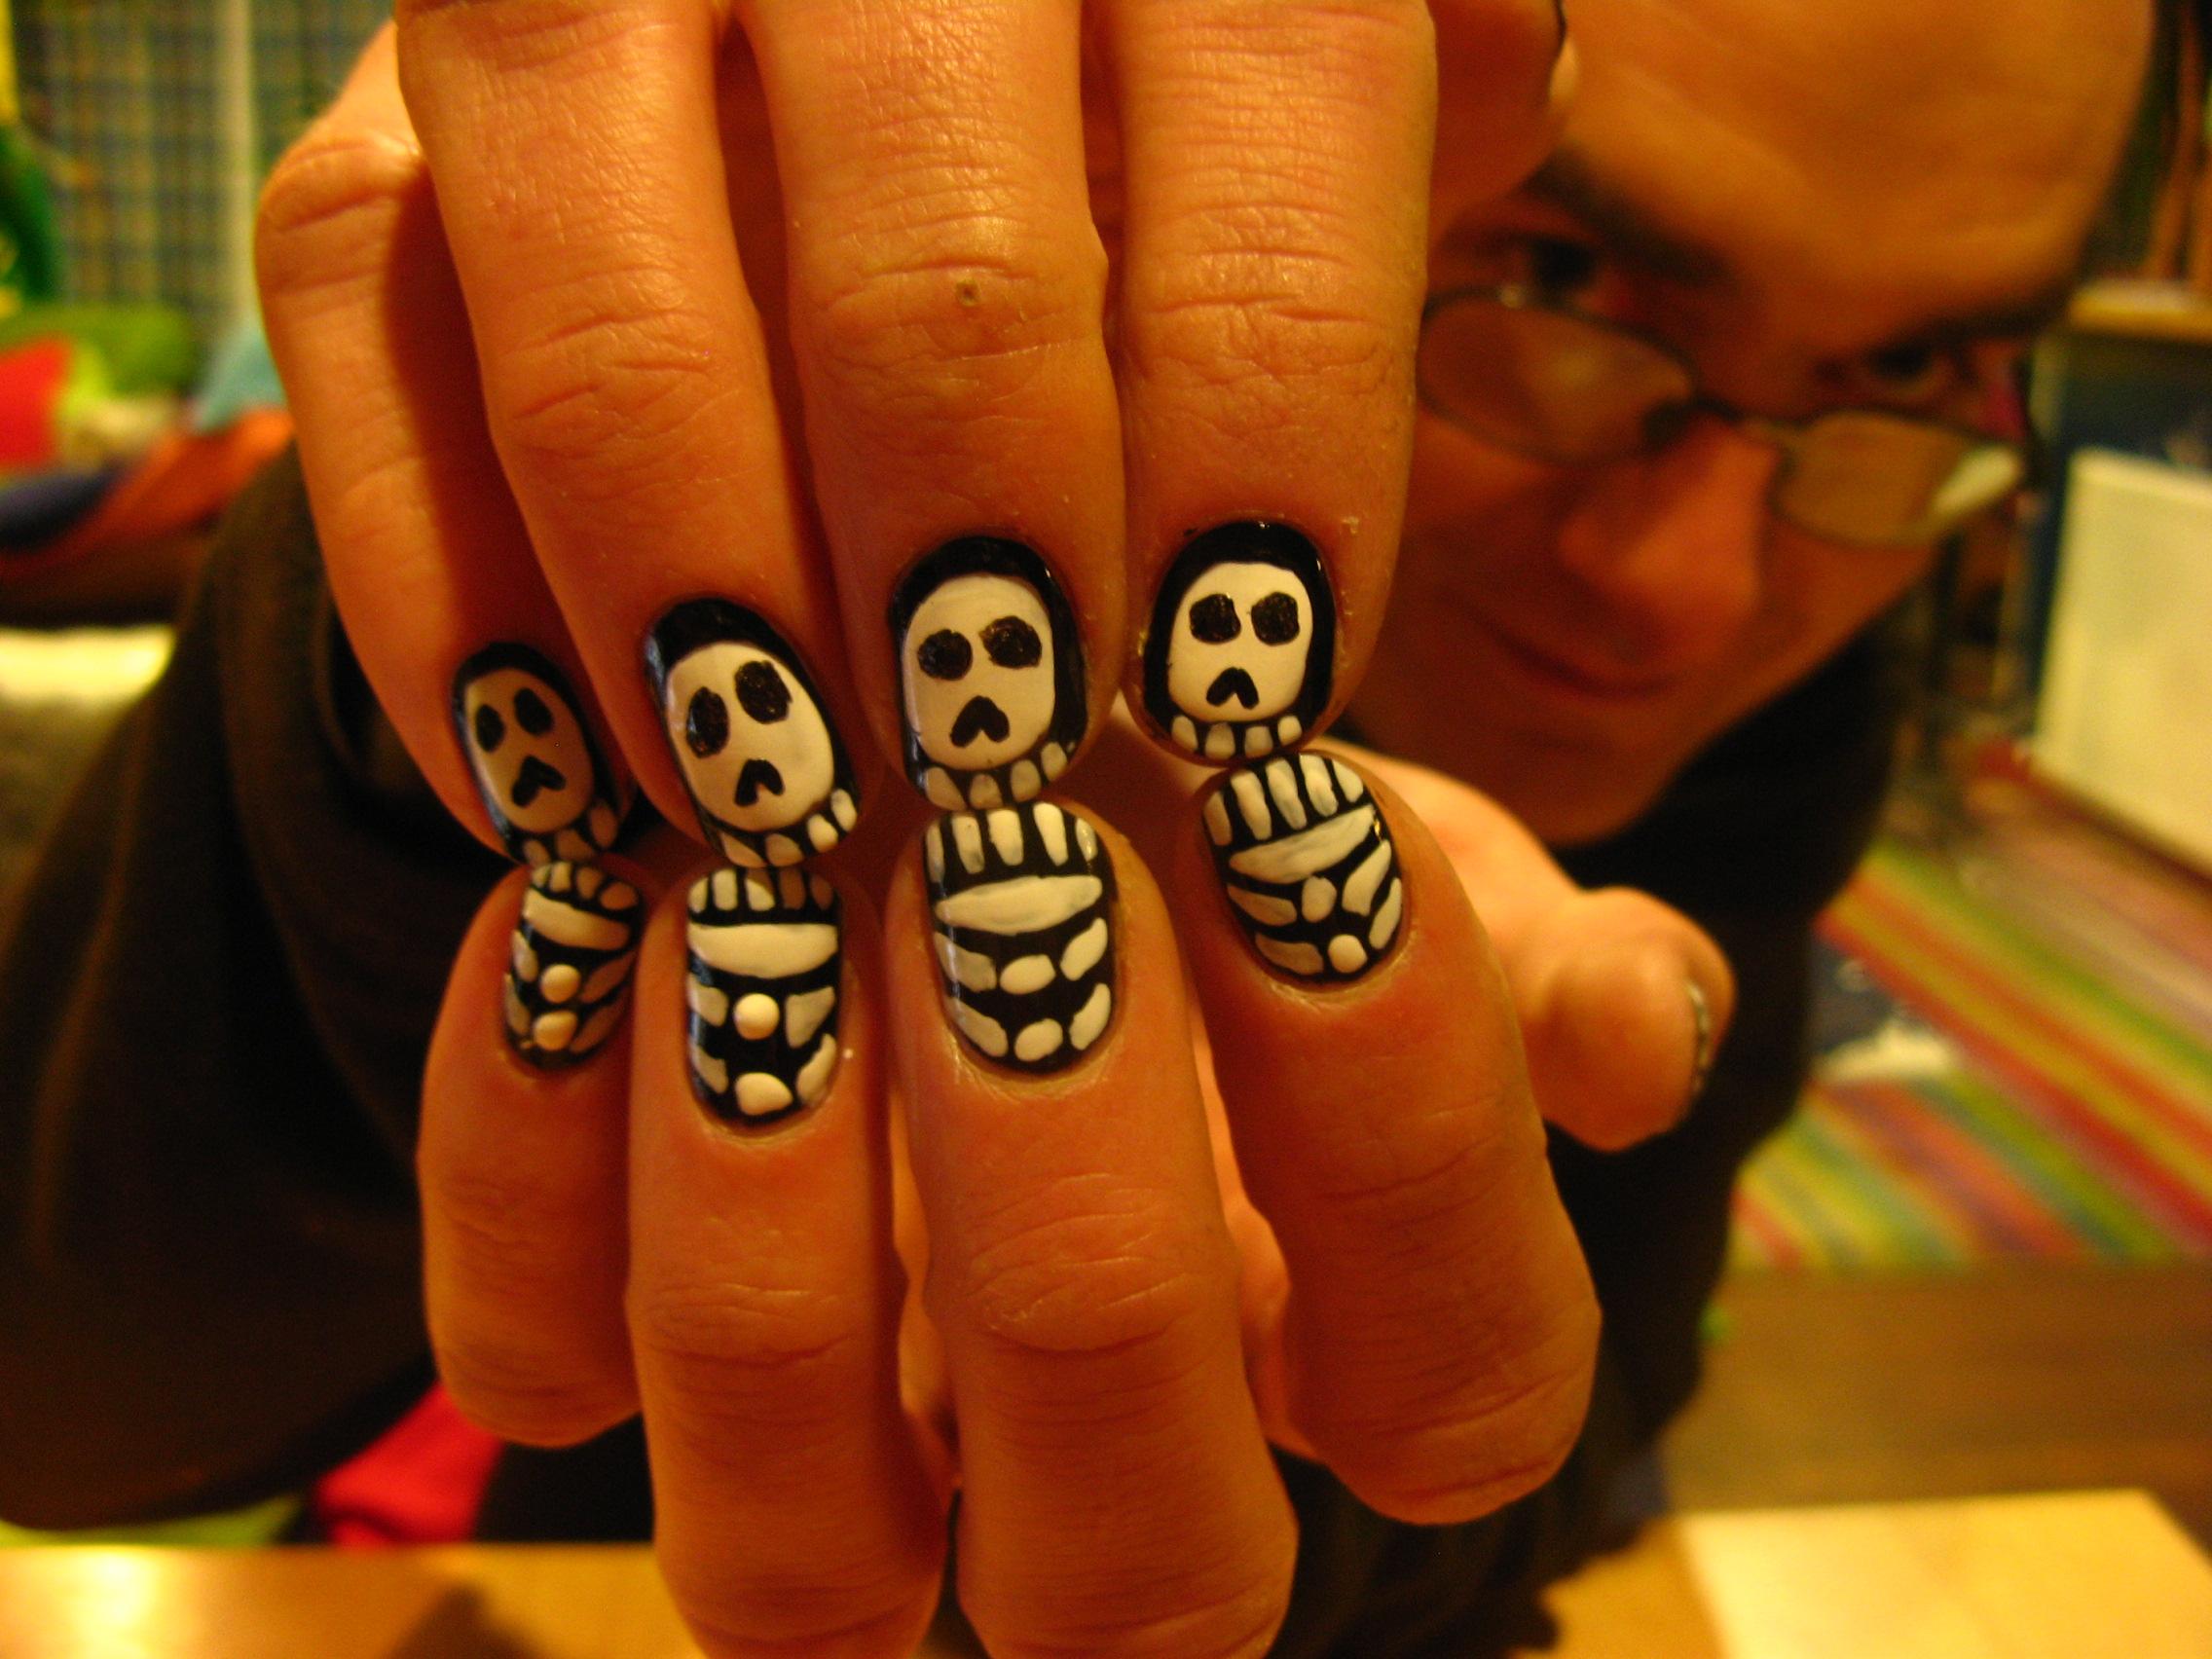 Grants Skull Nails Freehand Digital Imologue